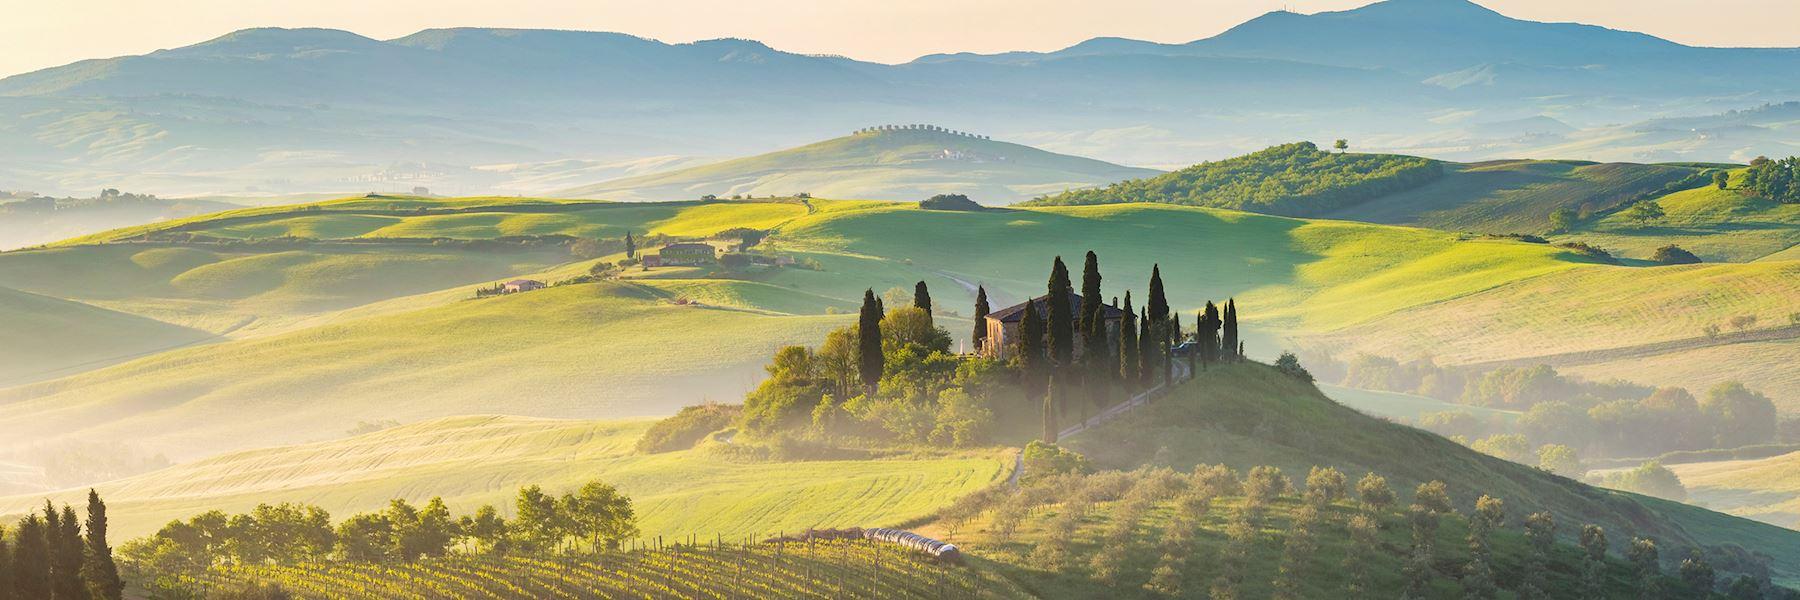 Tuscany holidays  2019 & 2020